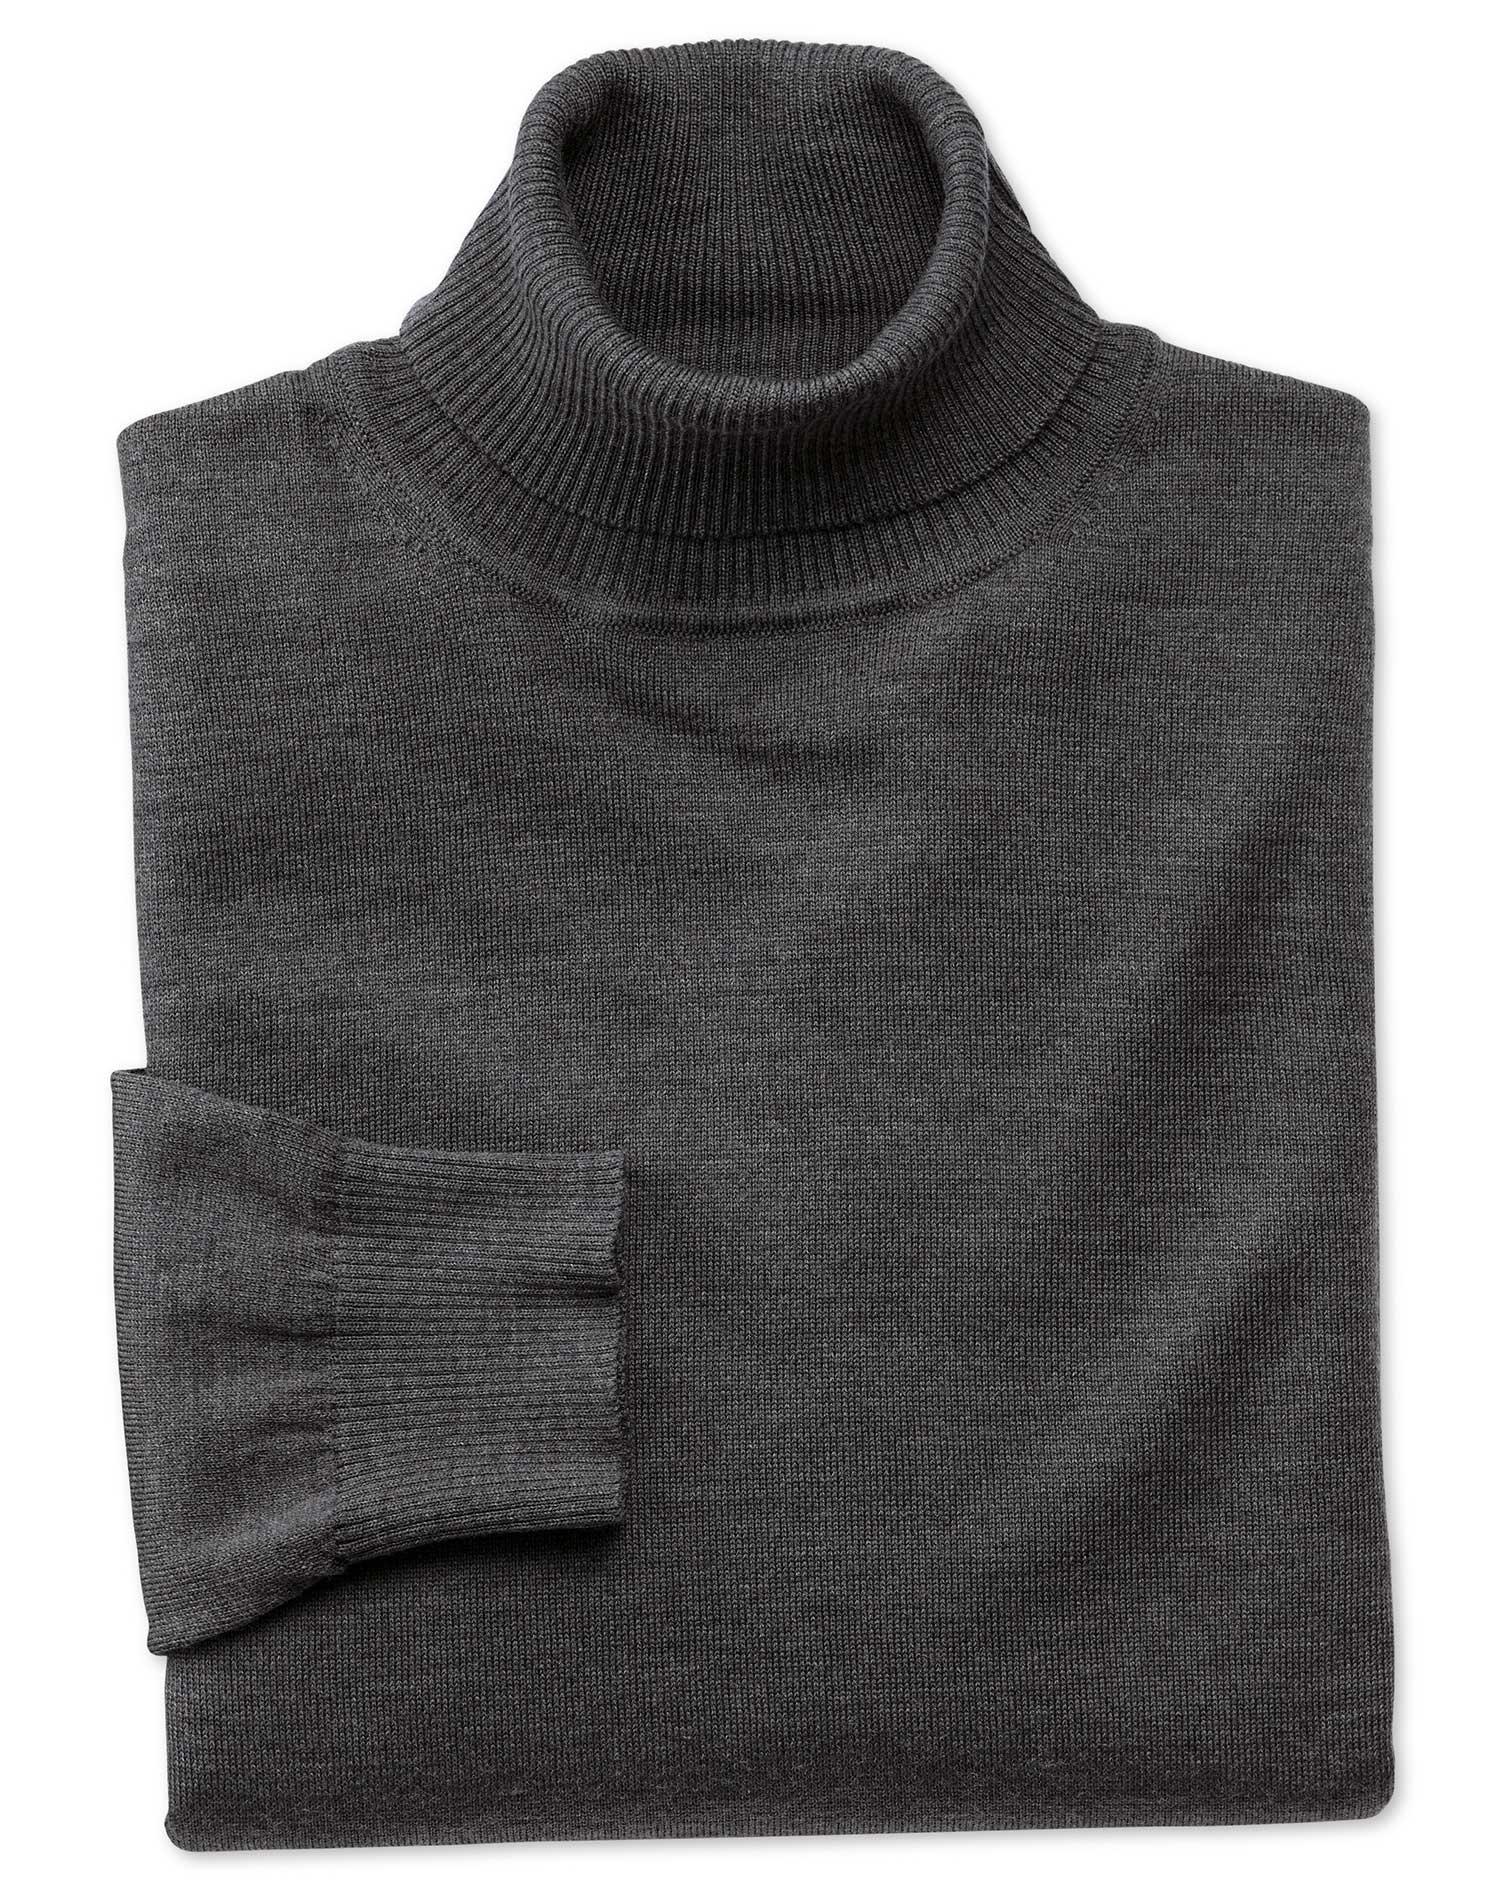 Charcoal Merino Wool Roll Neck Jumper Size XXL by Charles Tyrwhitt